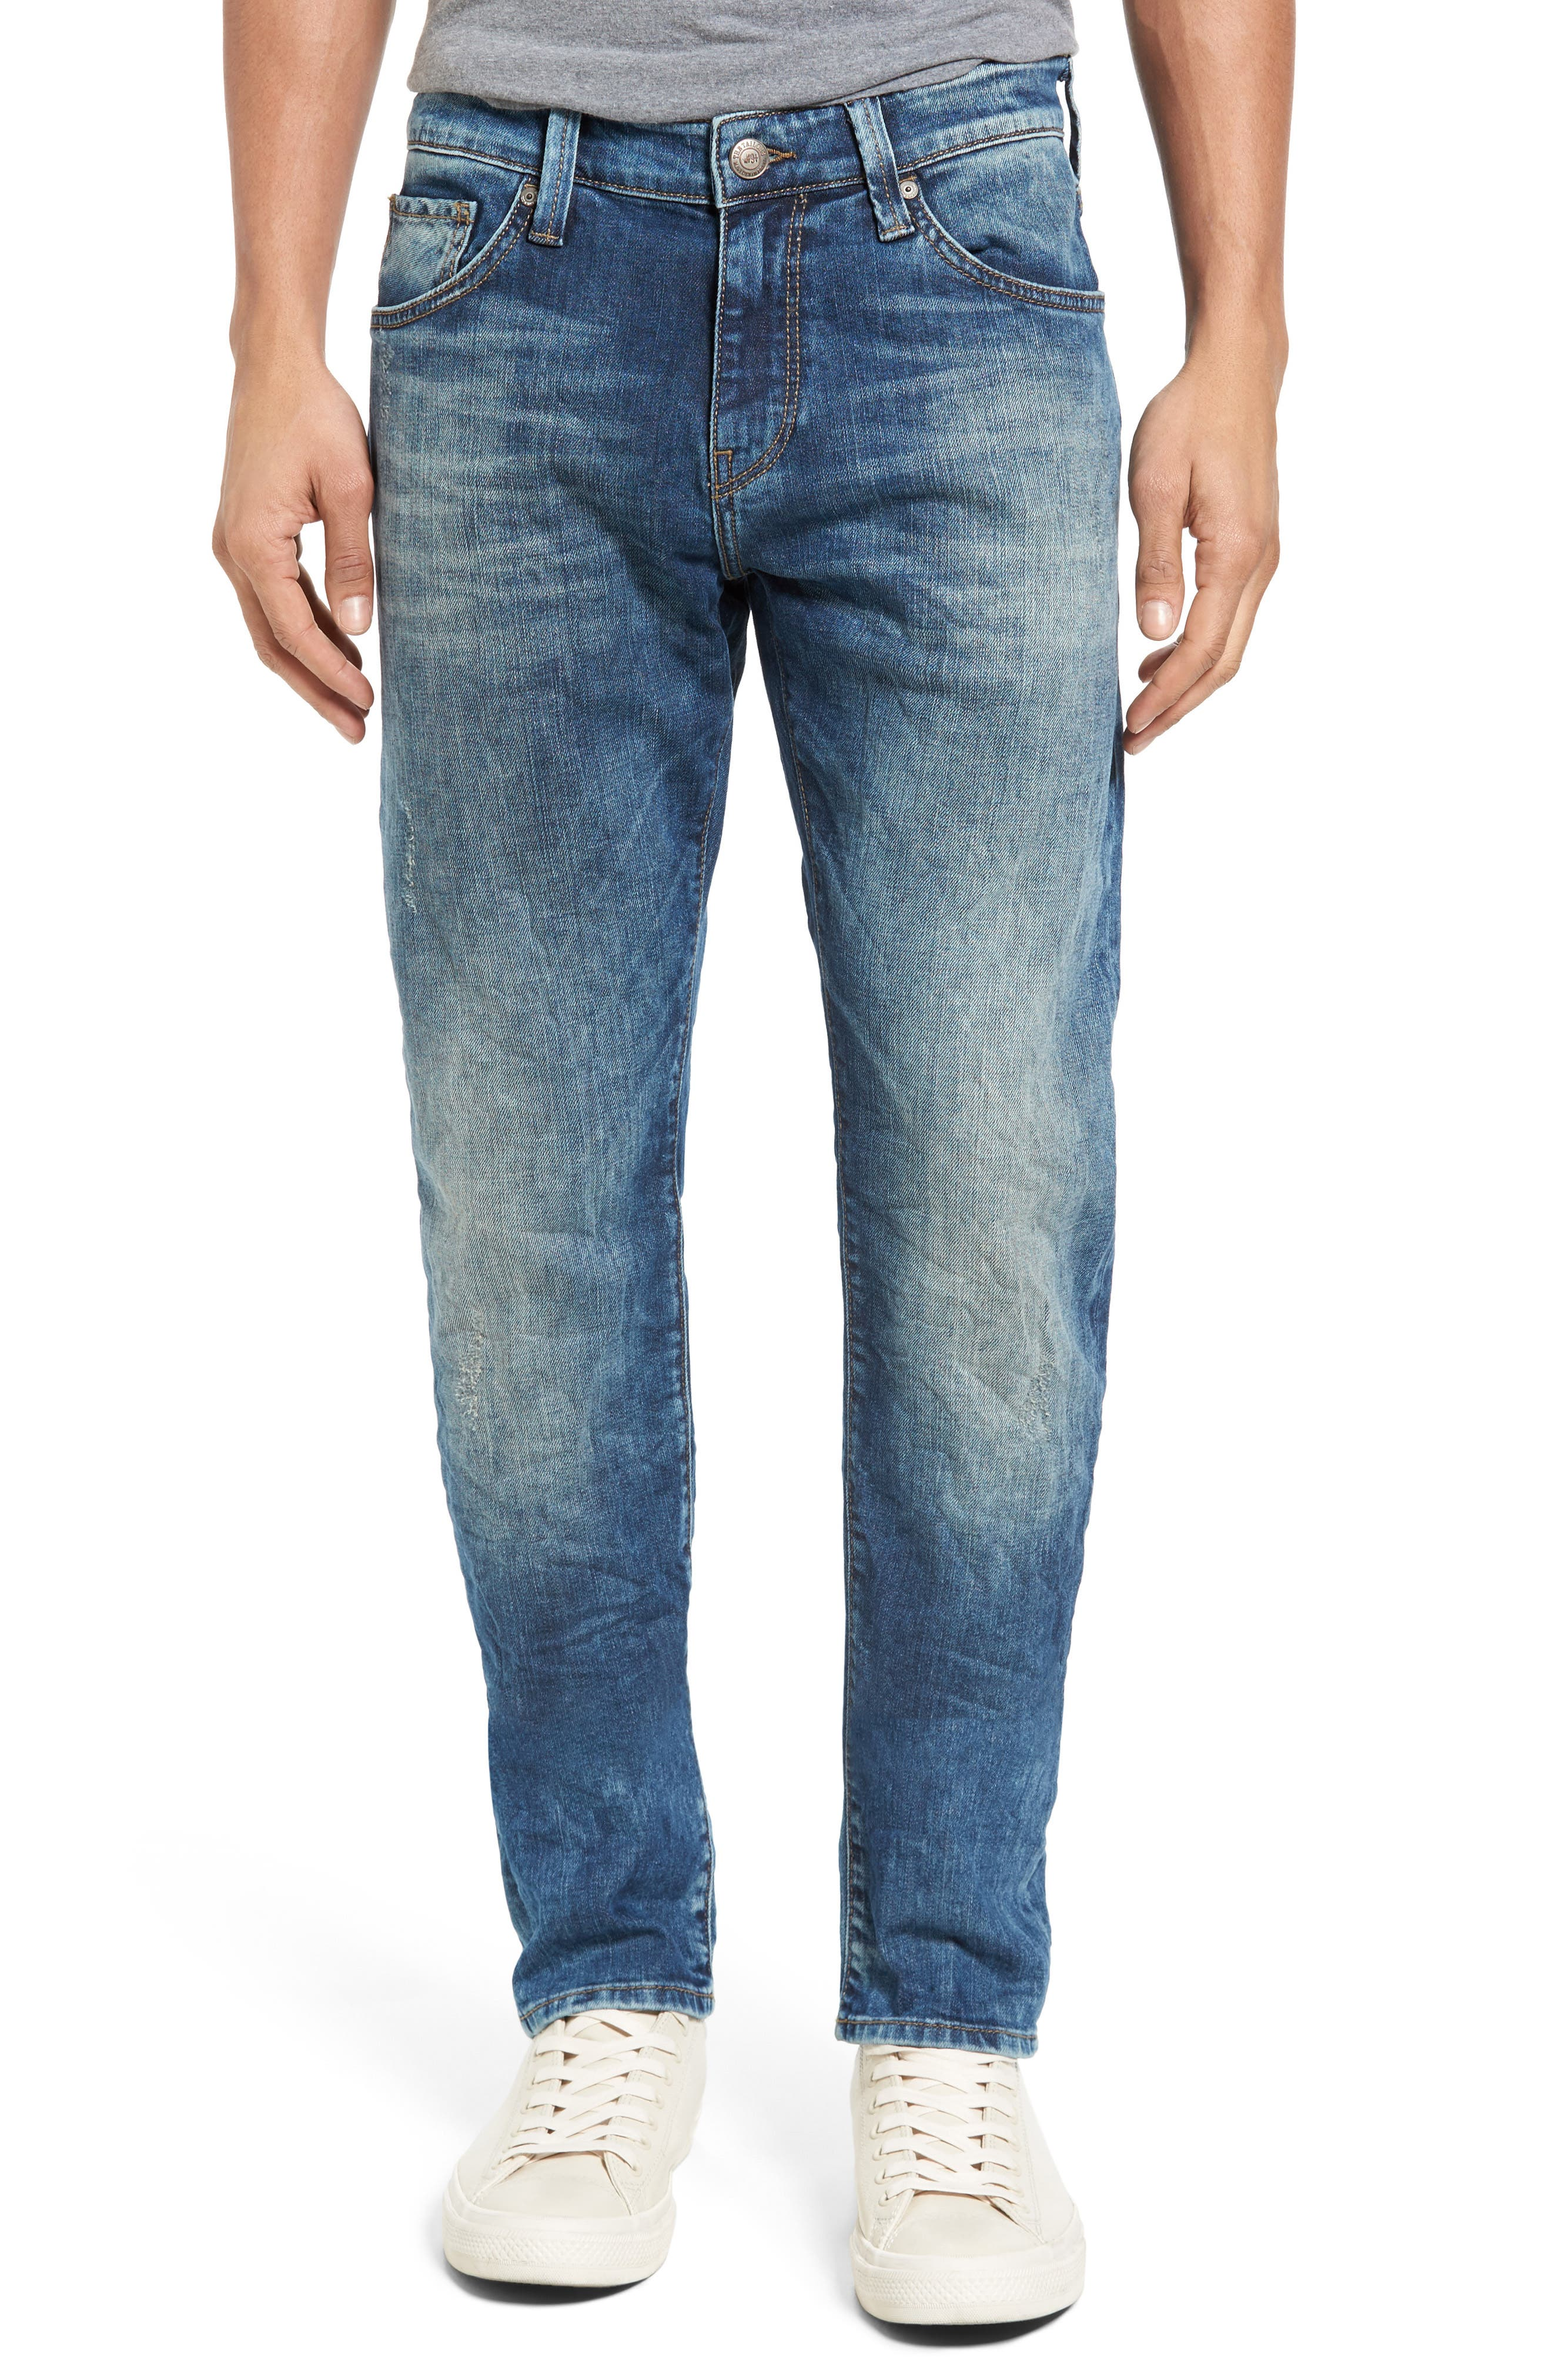 Mavi Jeans Jake Easy Slim Fit Jeans (Random Extreme Vintage)